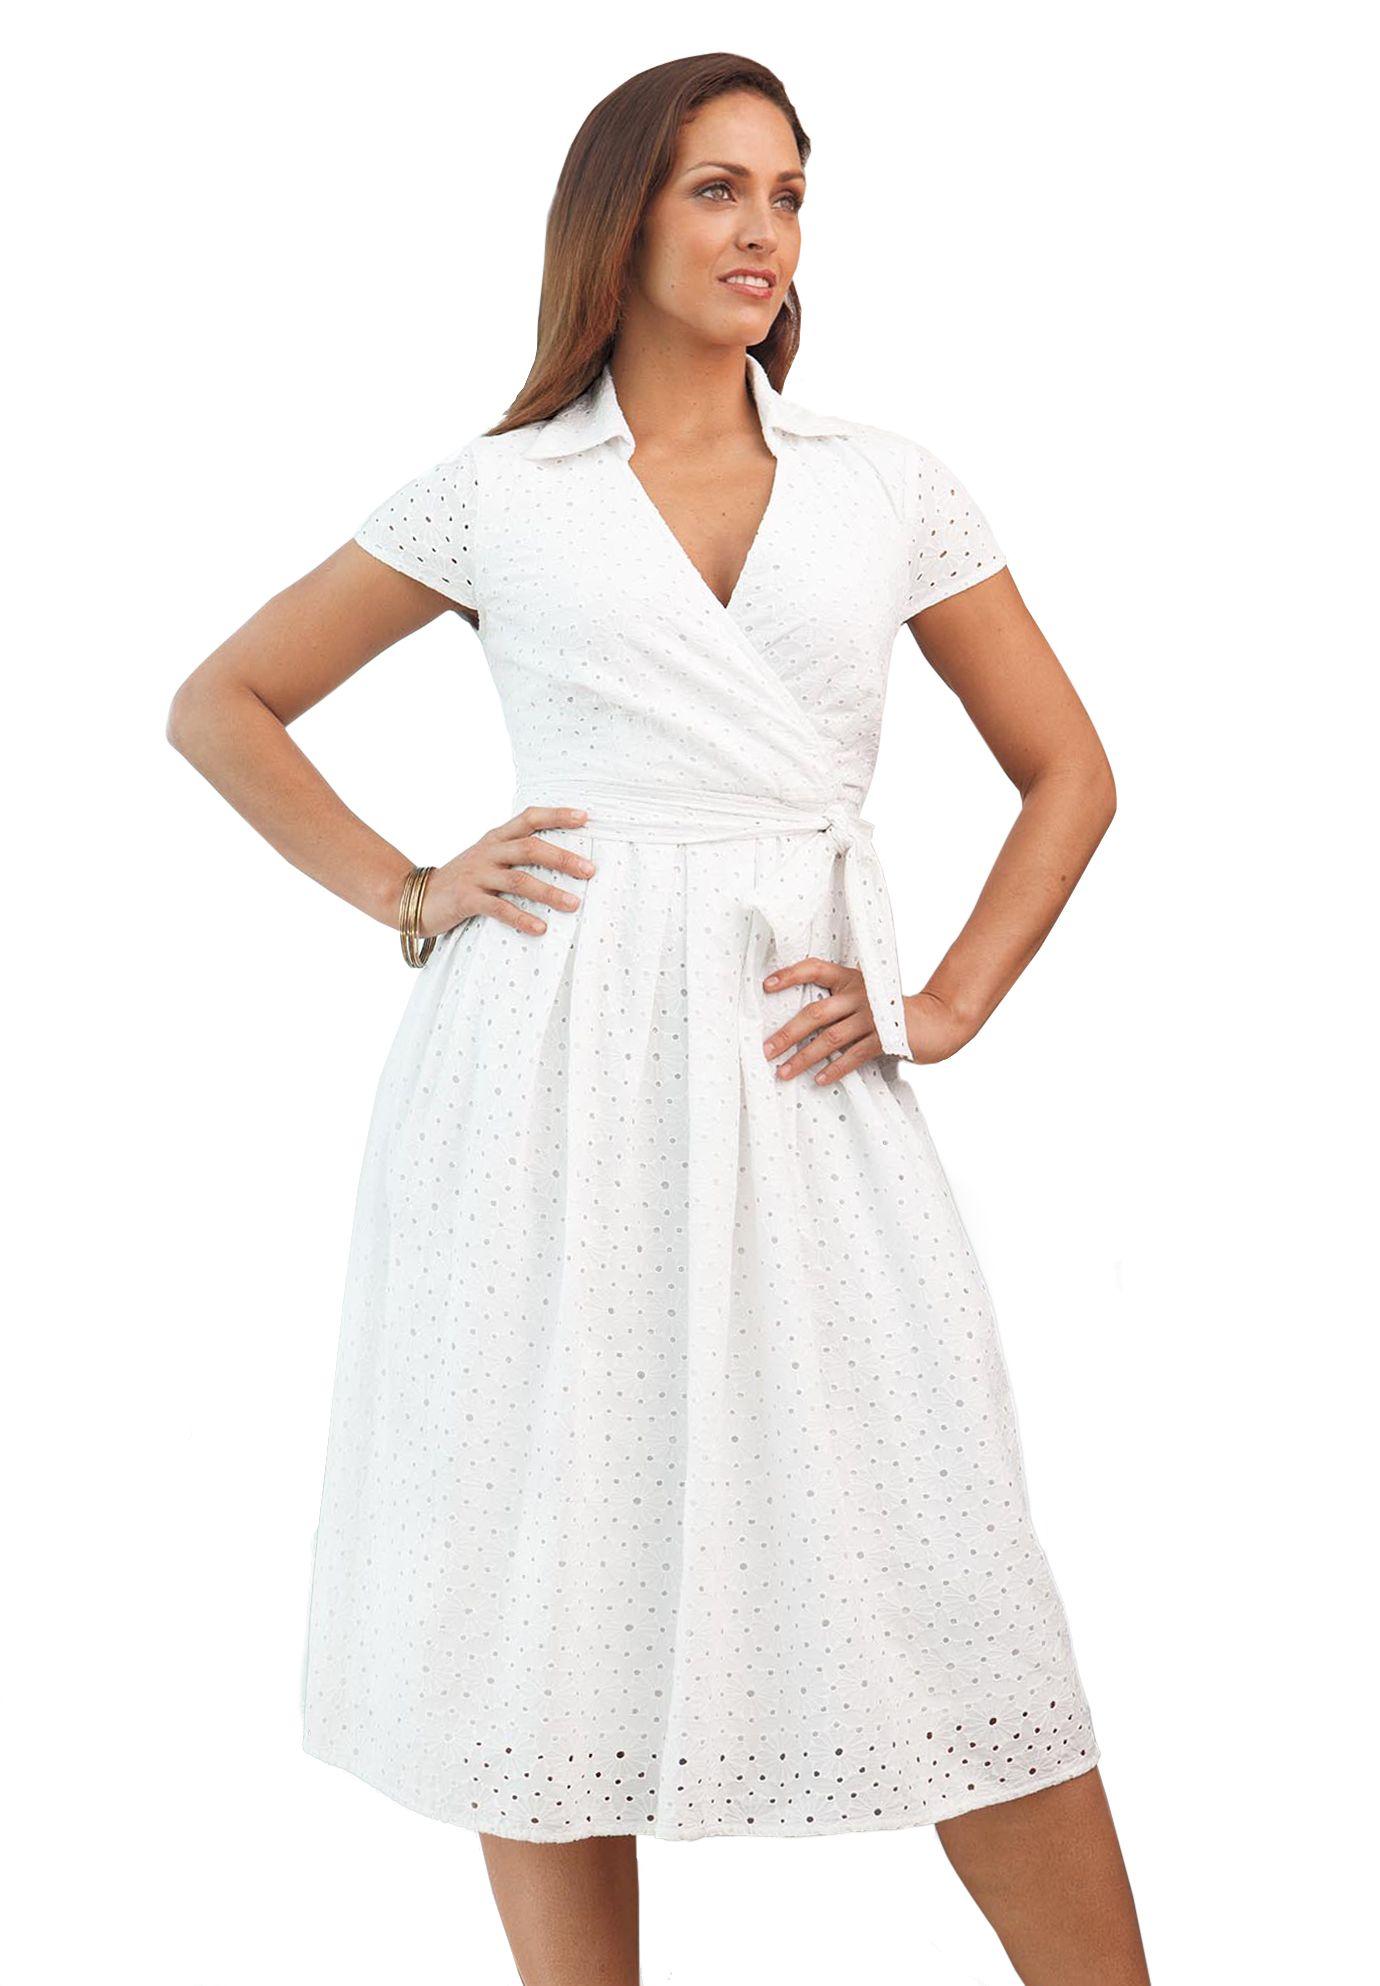 Cotton Eyelet Dress Plus Size Casual Dresses Jessica London